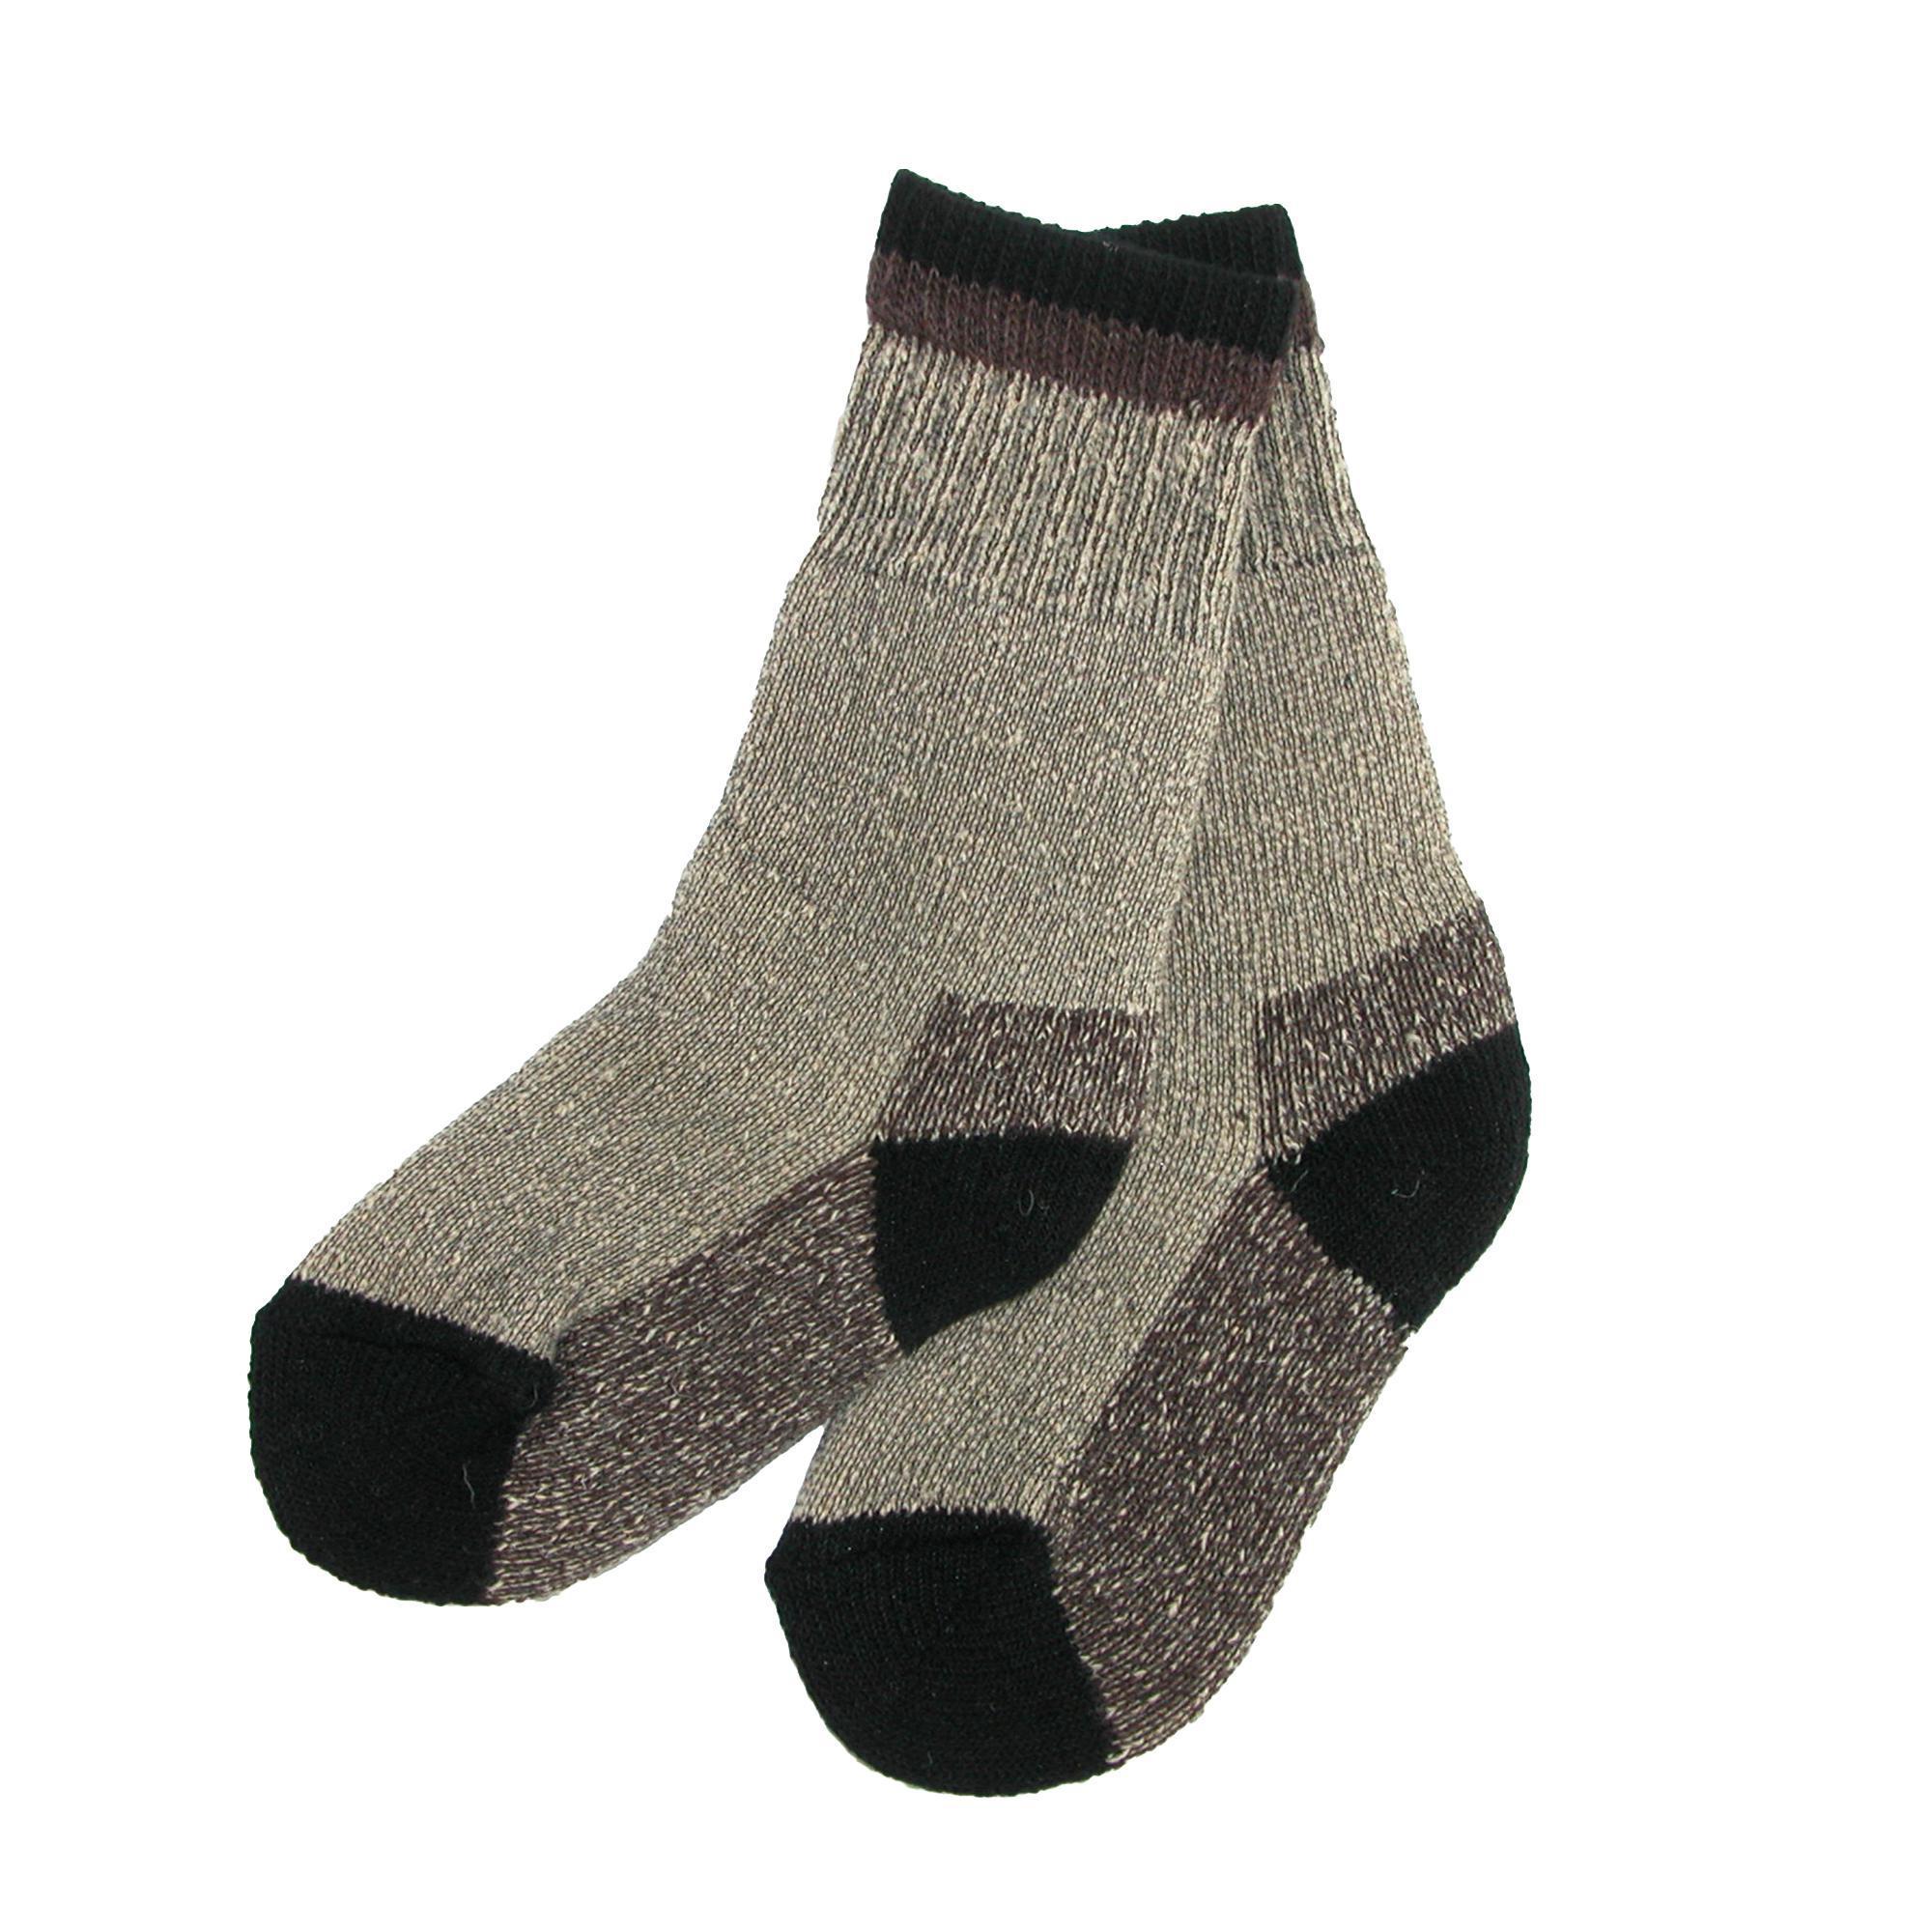 Clear Creek Boy's Wool Hiking Socks (2 Pair Pack) - Black Small